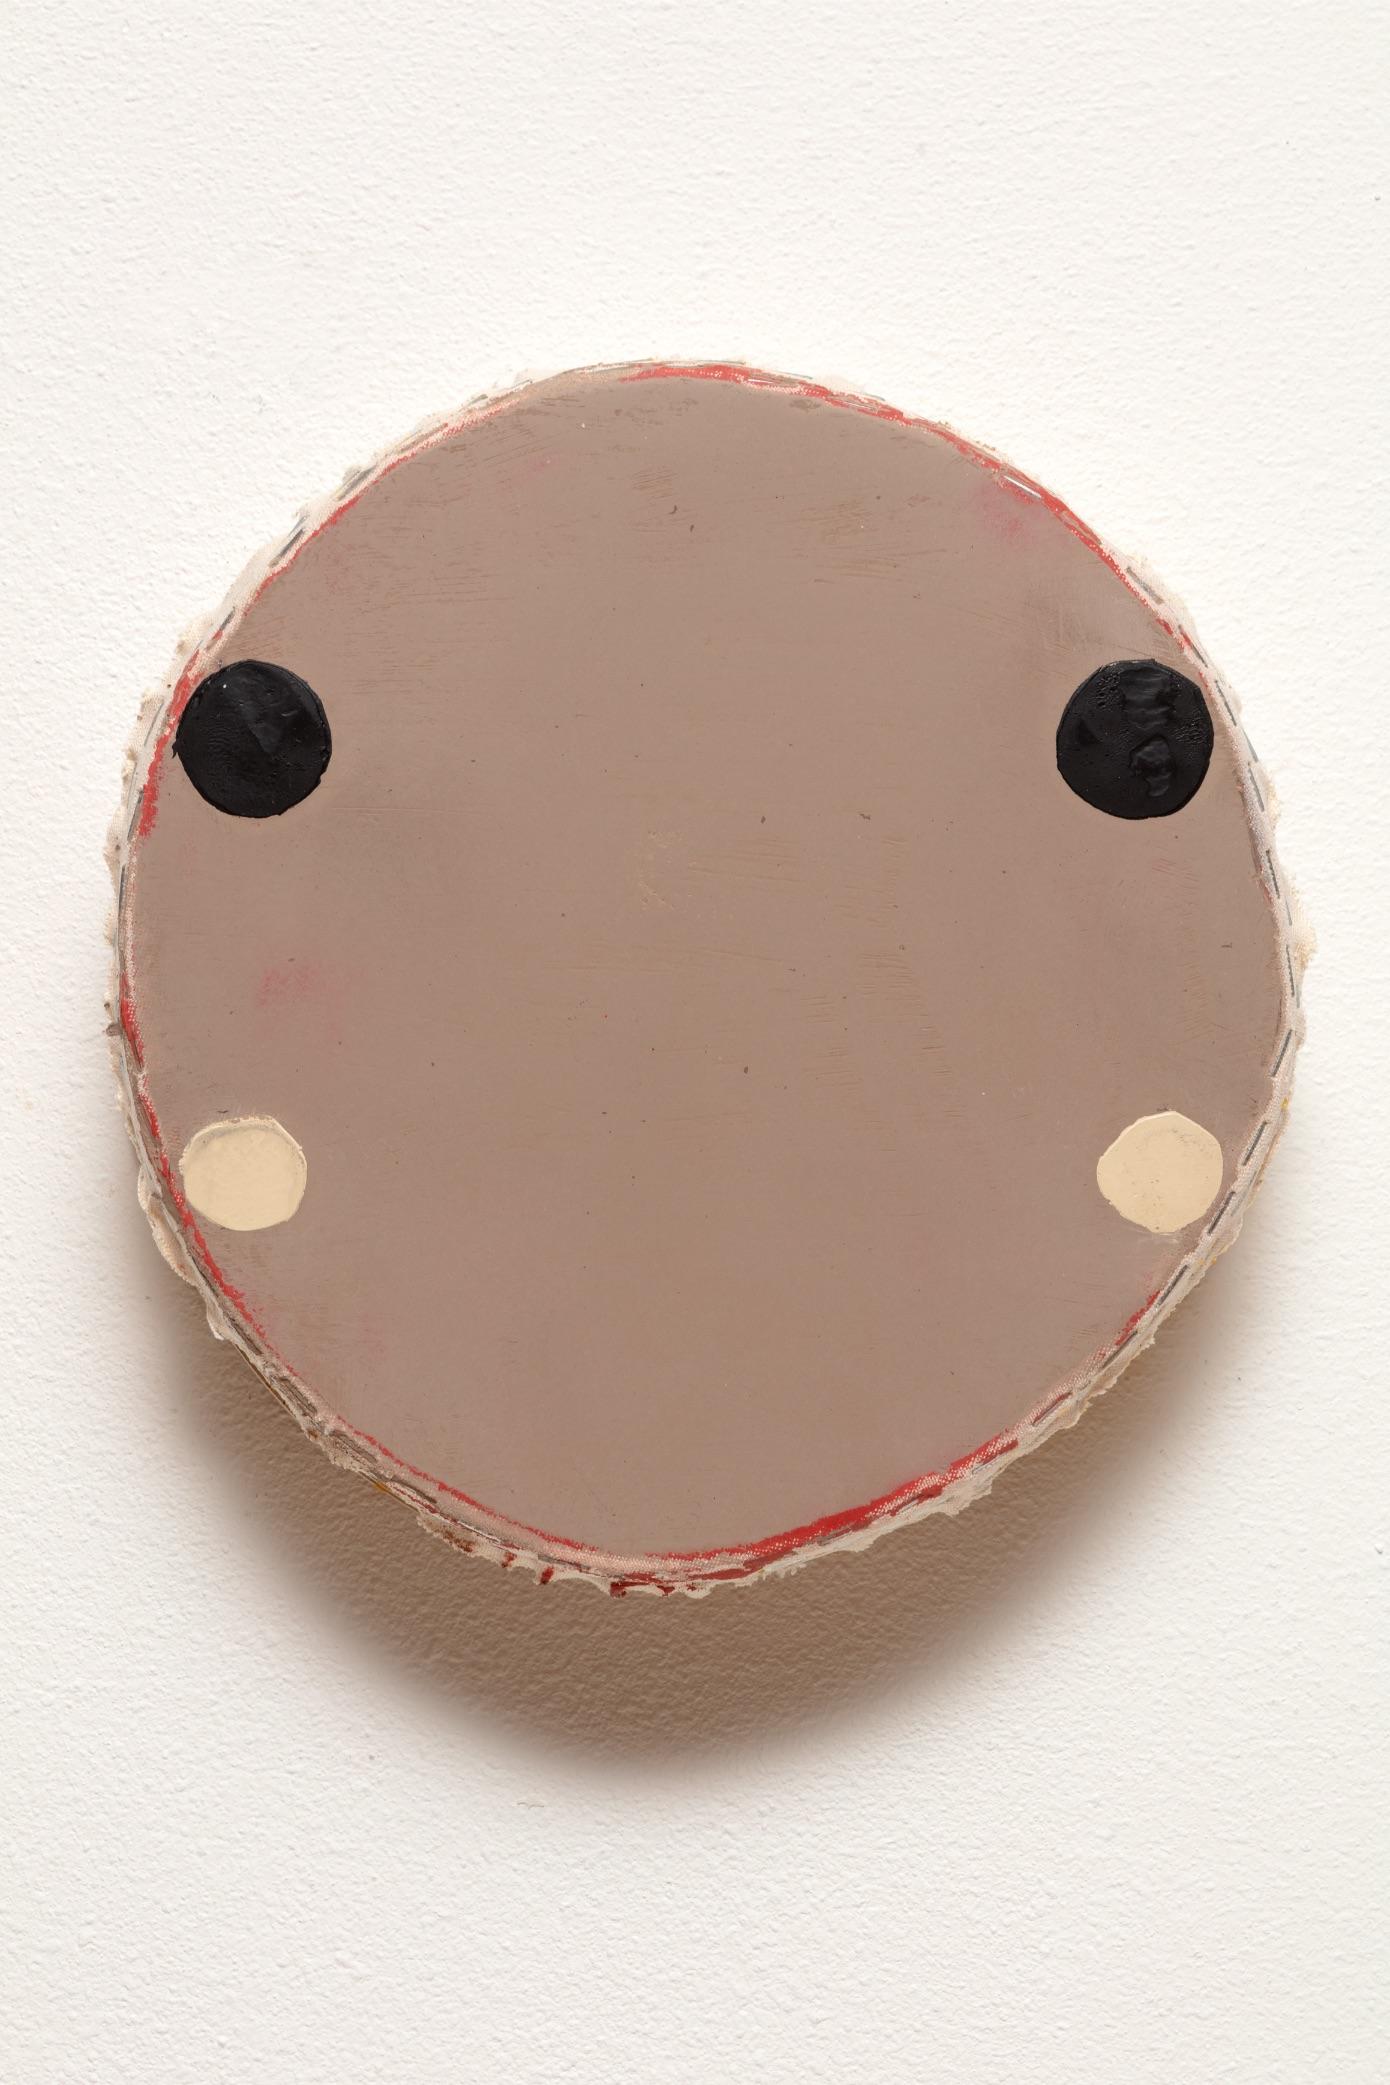 "7: Otis Jones - Four Circles,Two Black - Acrylic on Canvas 12"" x 11 1⁄2"" x 3"" - 2019"